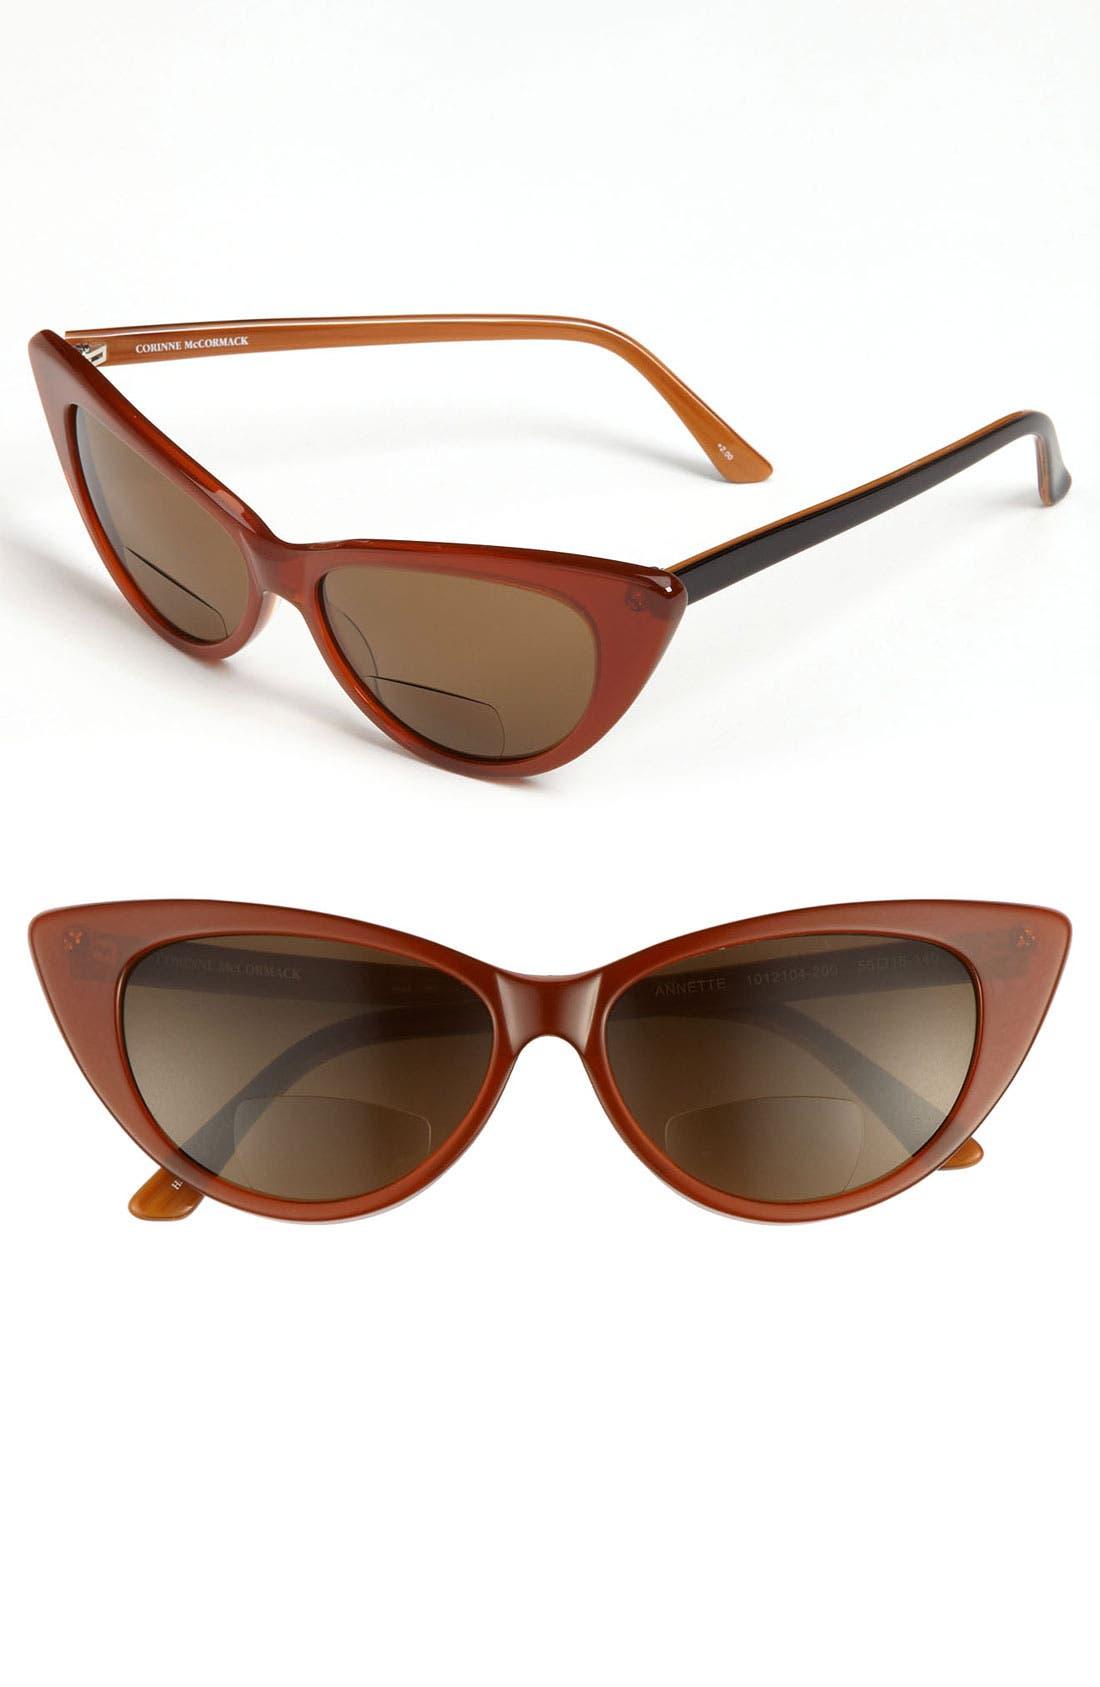 Main Image - Corinne McCormack Bifocal Reading Sunglasses